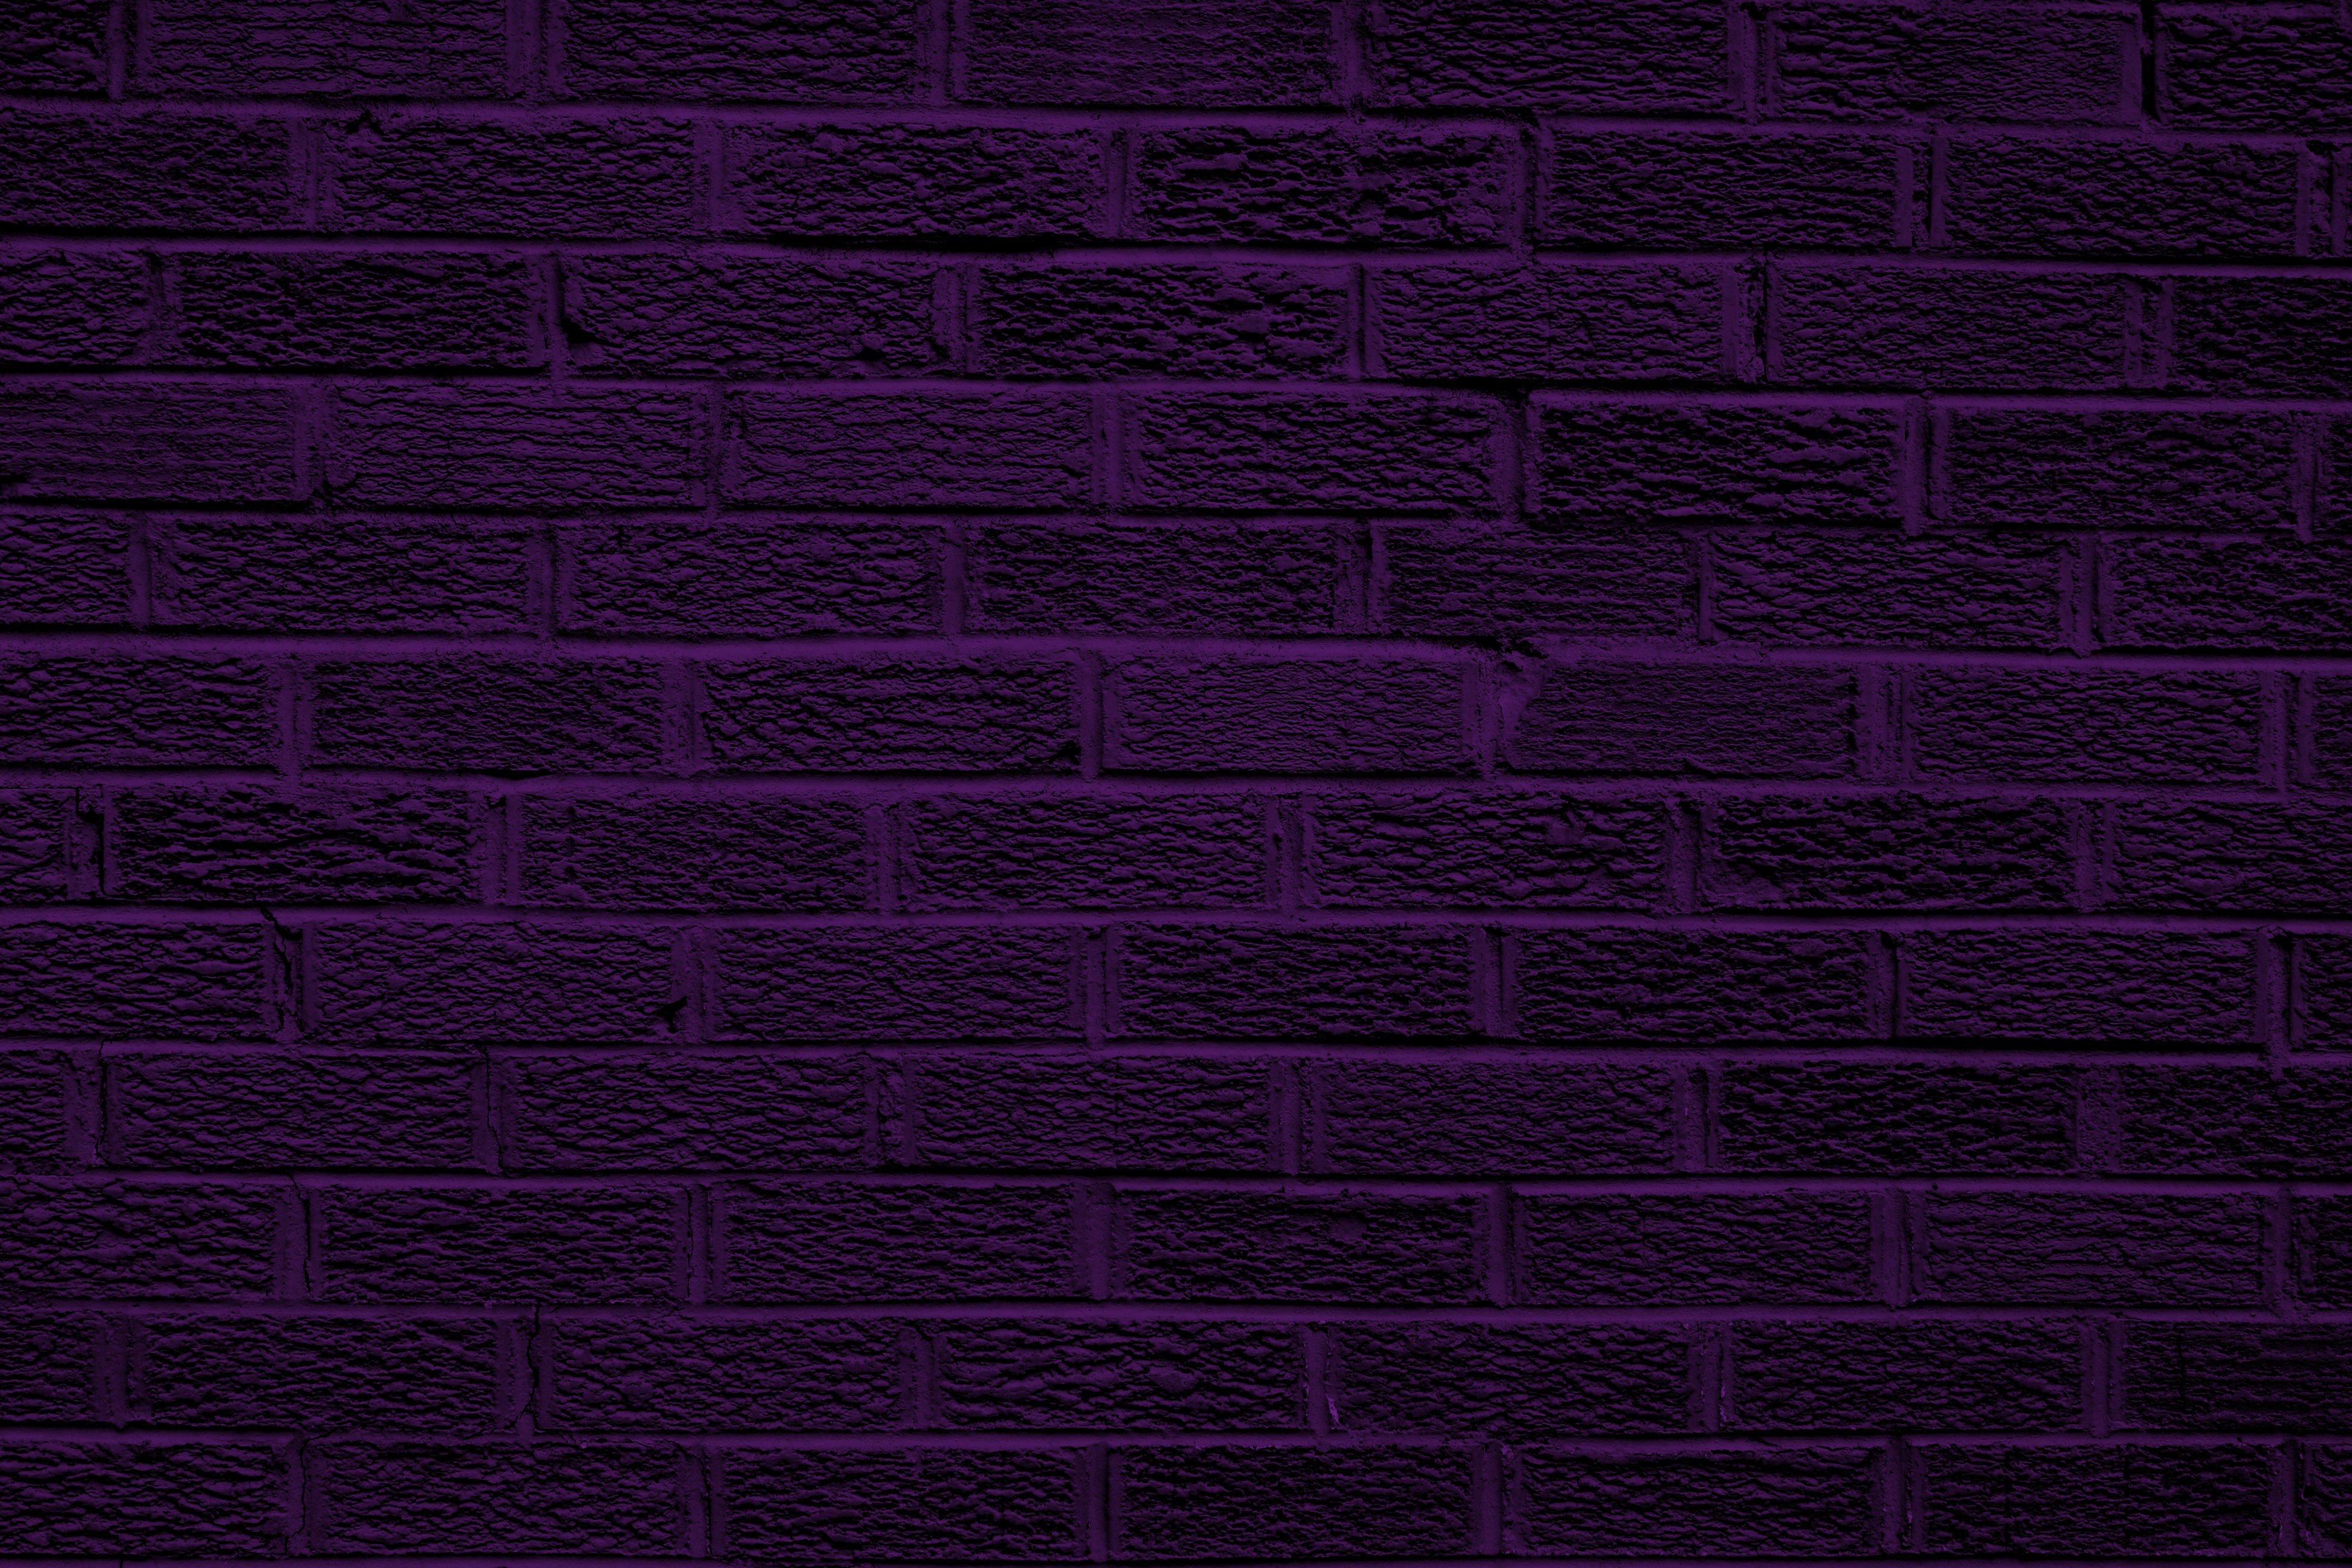 Dark Purple Brick Wall Texture Picture Photograph Photos 3888x2592